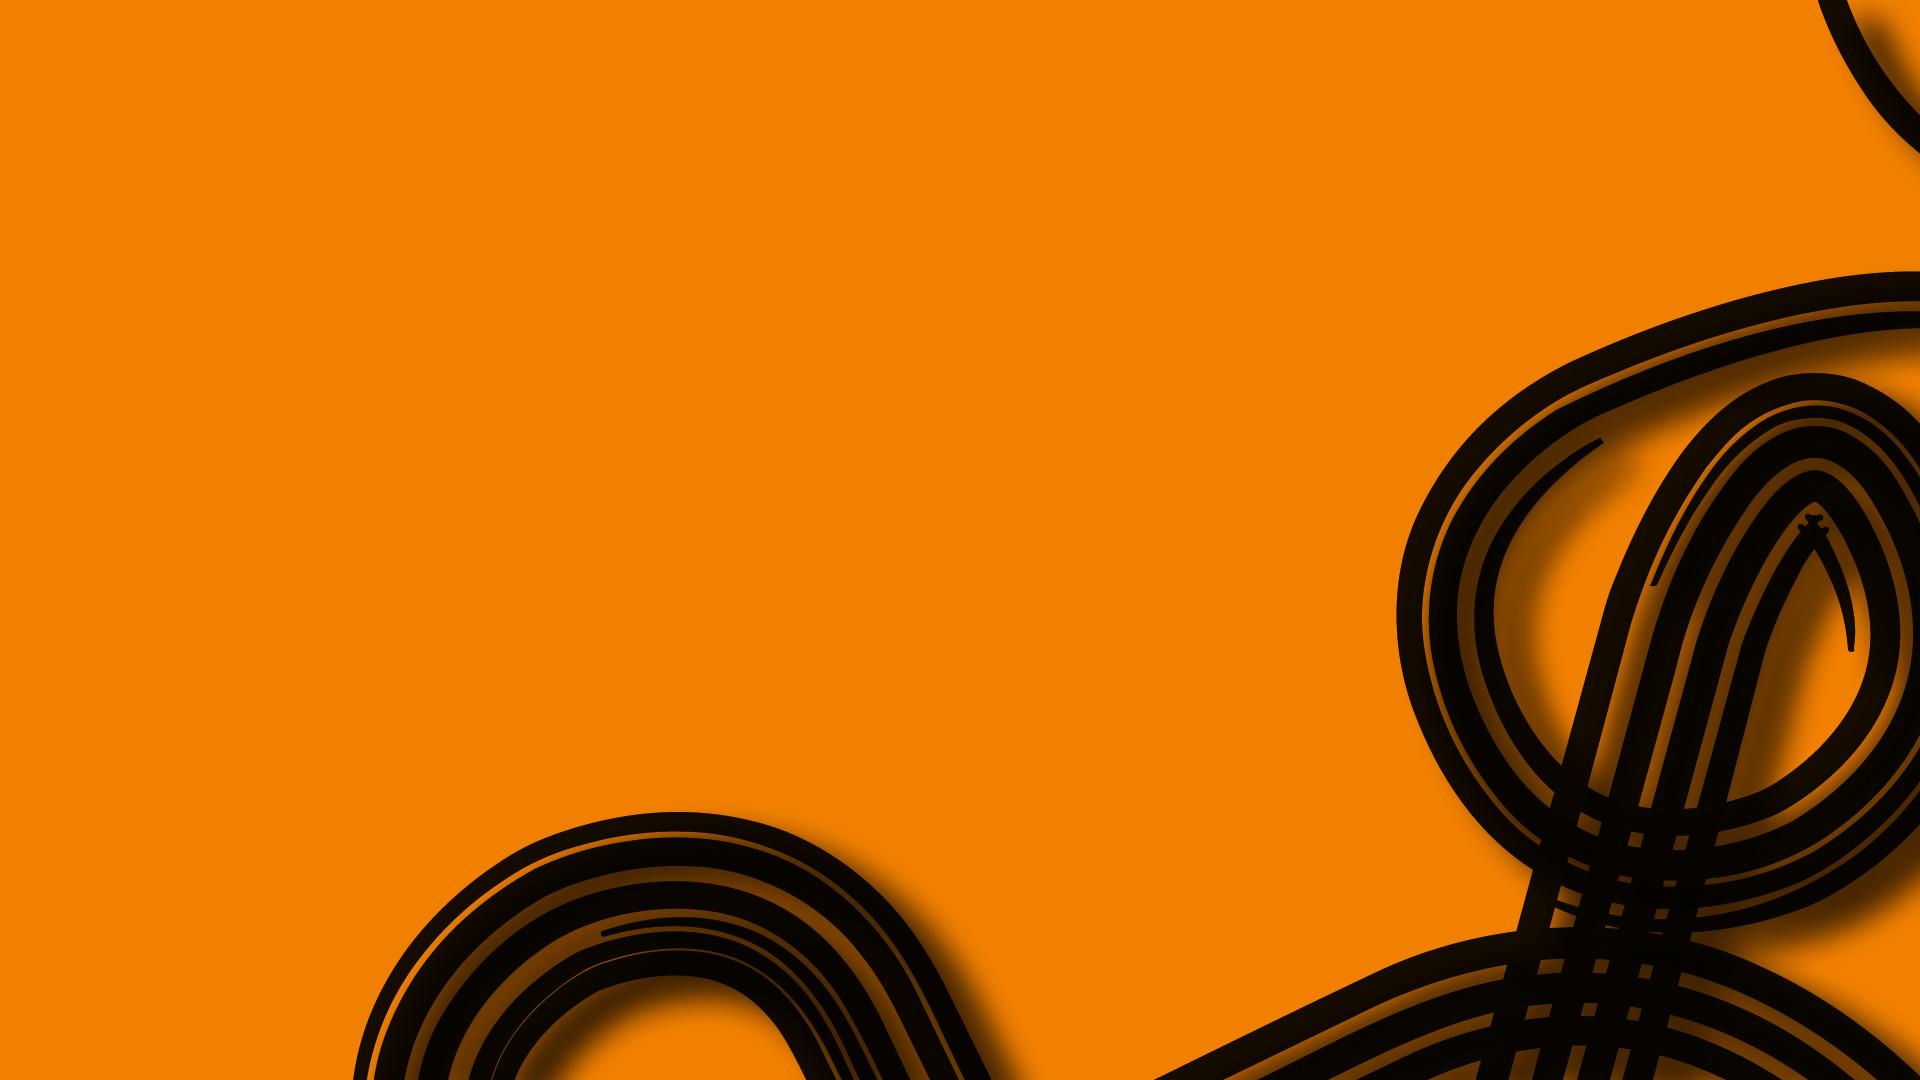 Res: 1920x1080, orange black curve #9dnn